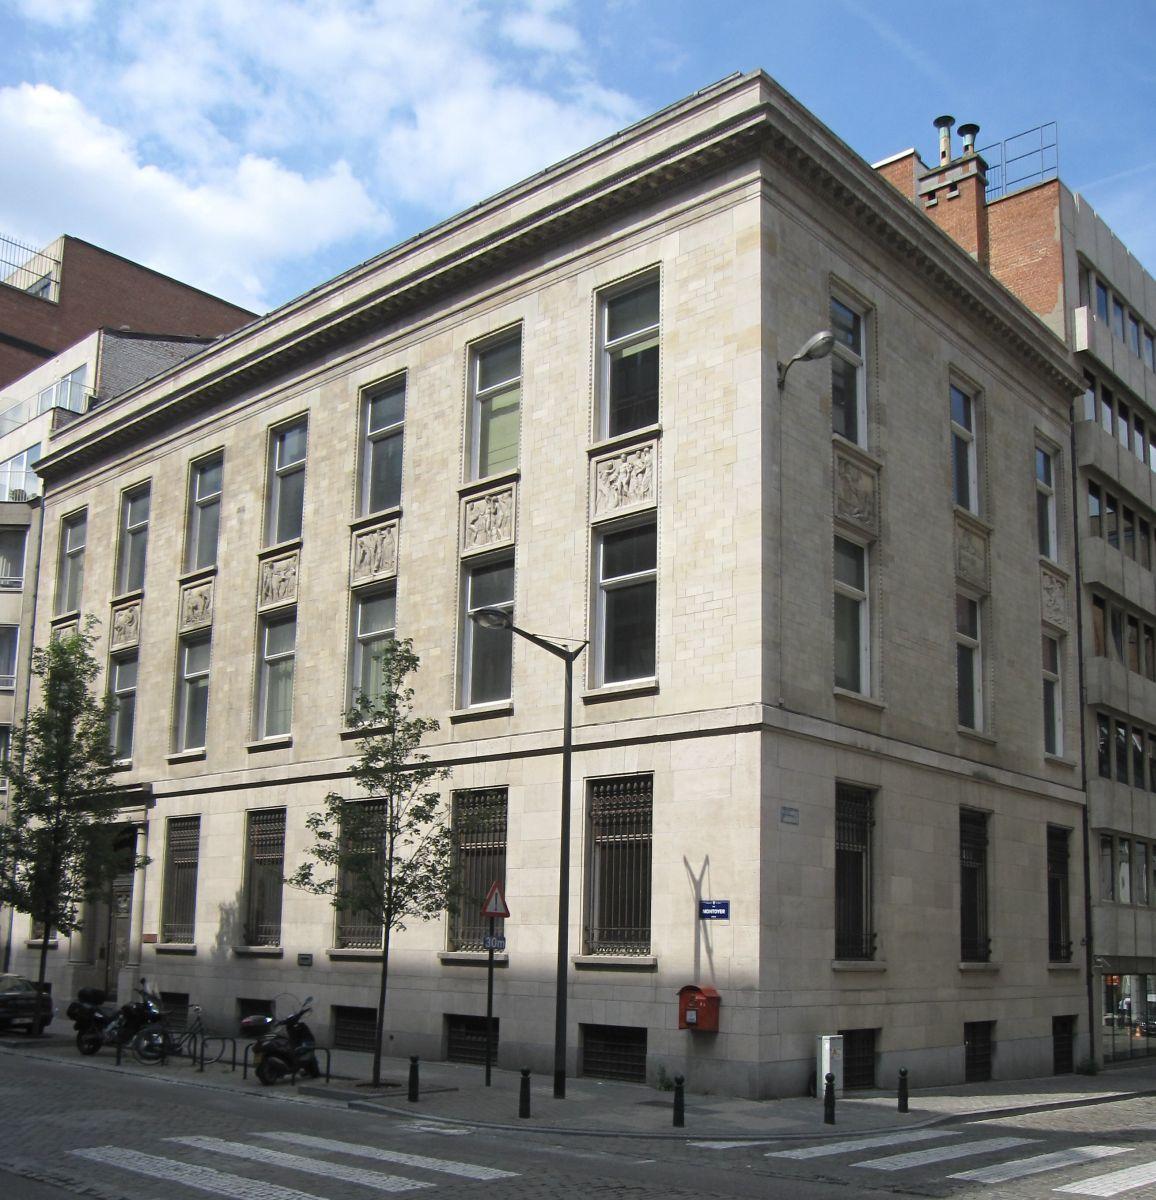 Montoyerstraat 8, 2009